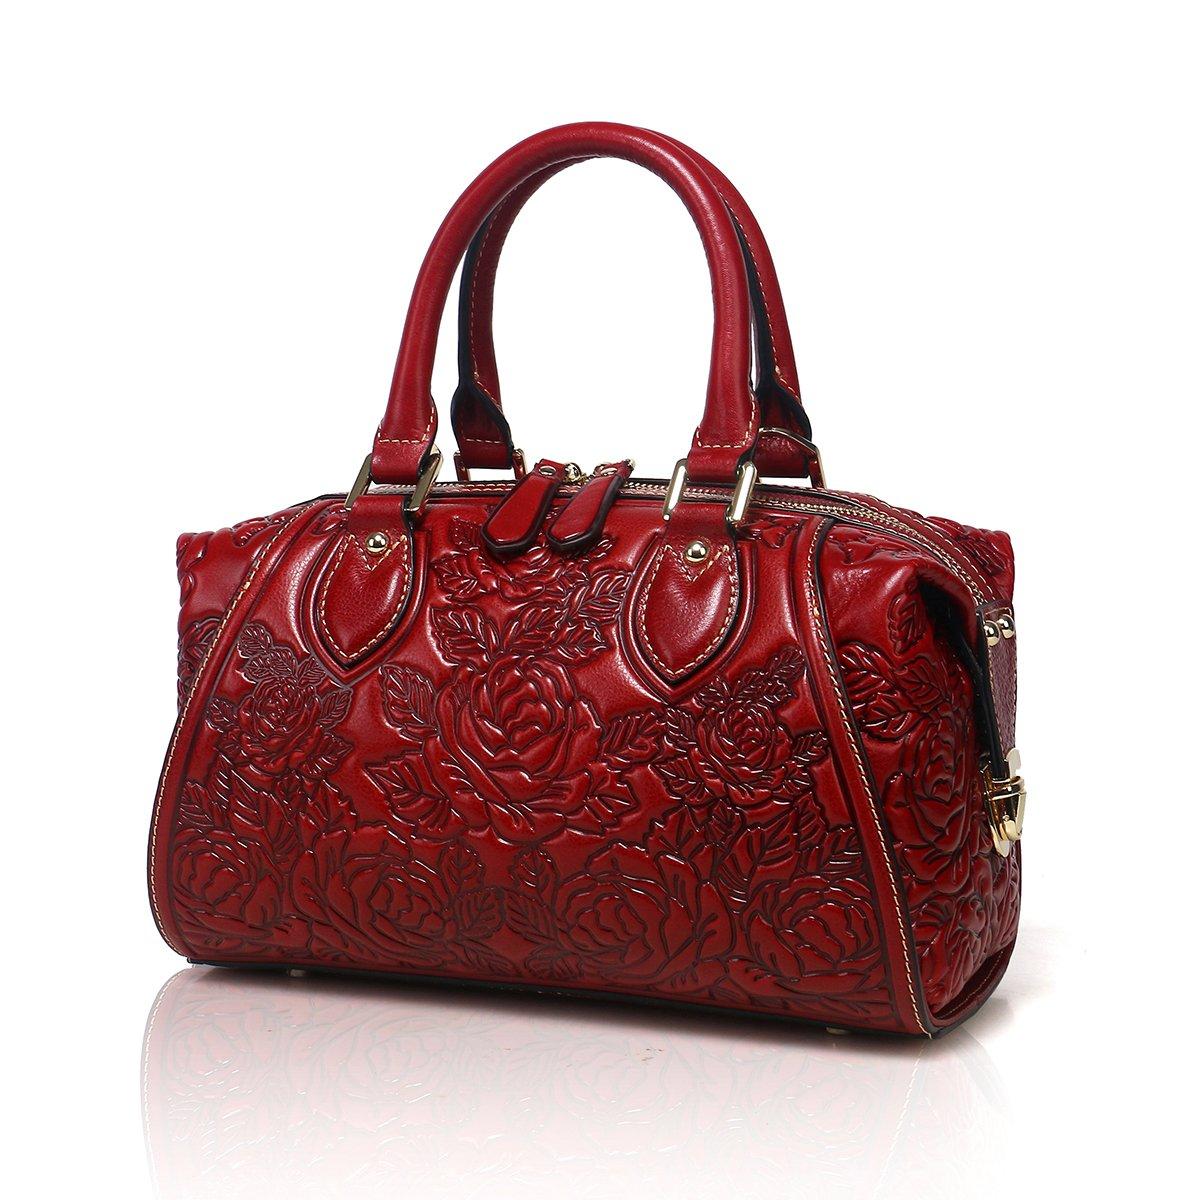 APHISON Designer Unique Embossed Floral Header Layer Cowhide Tote Style Ladies Top Handle Bags Handbags (Red)